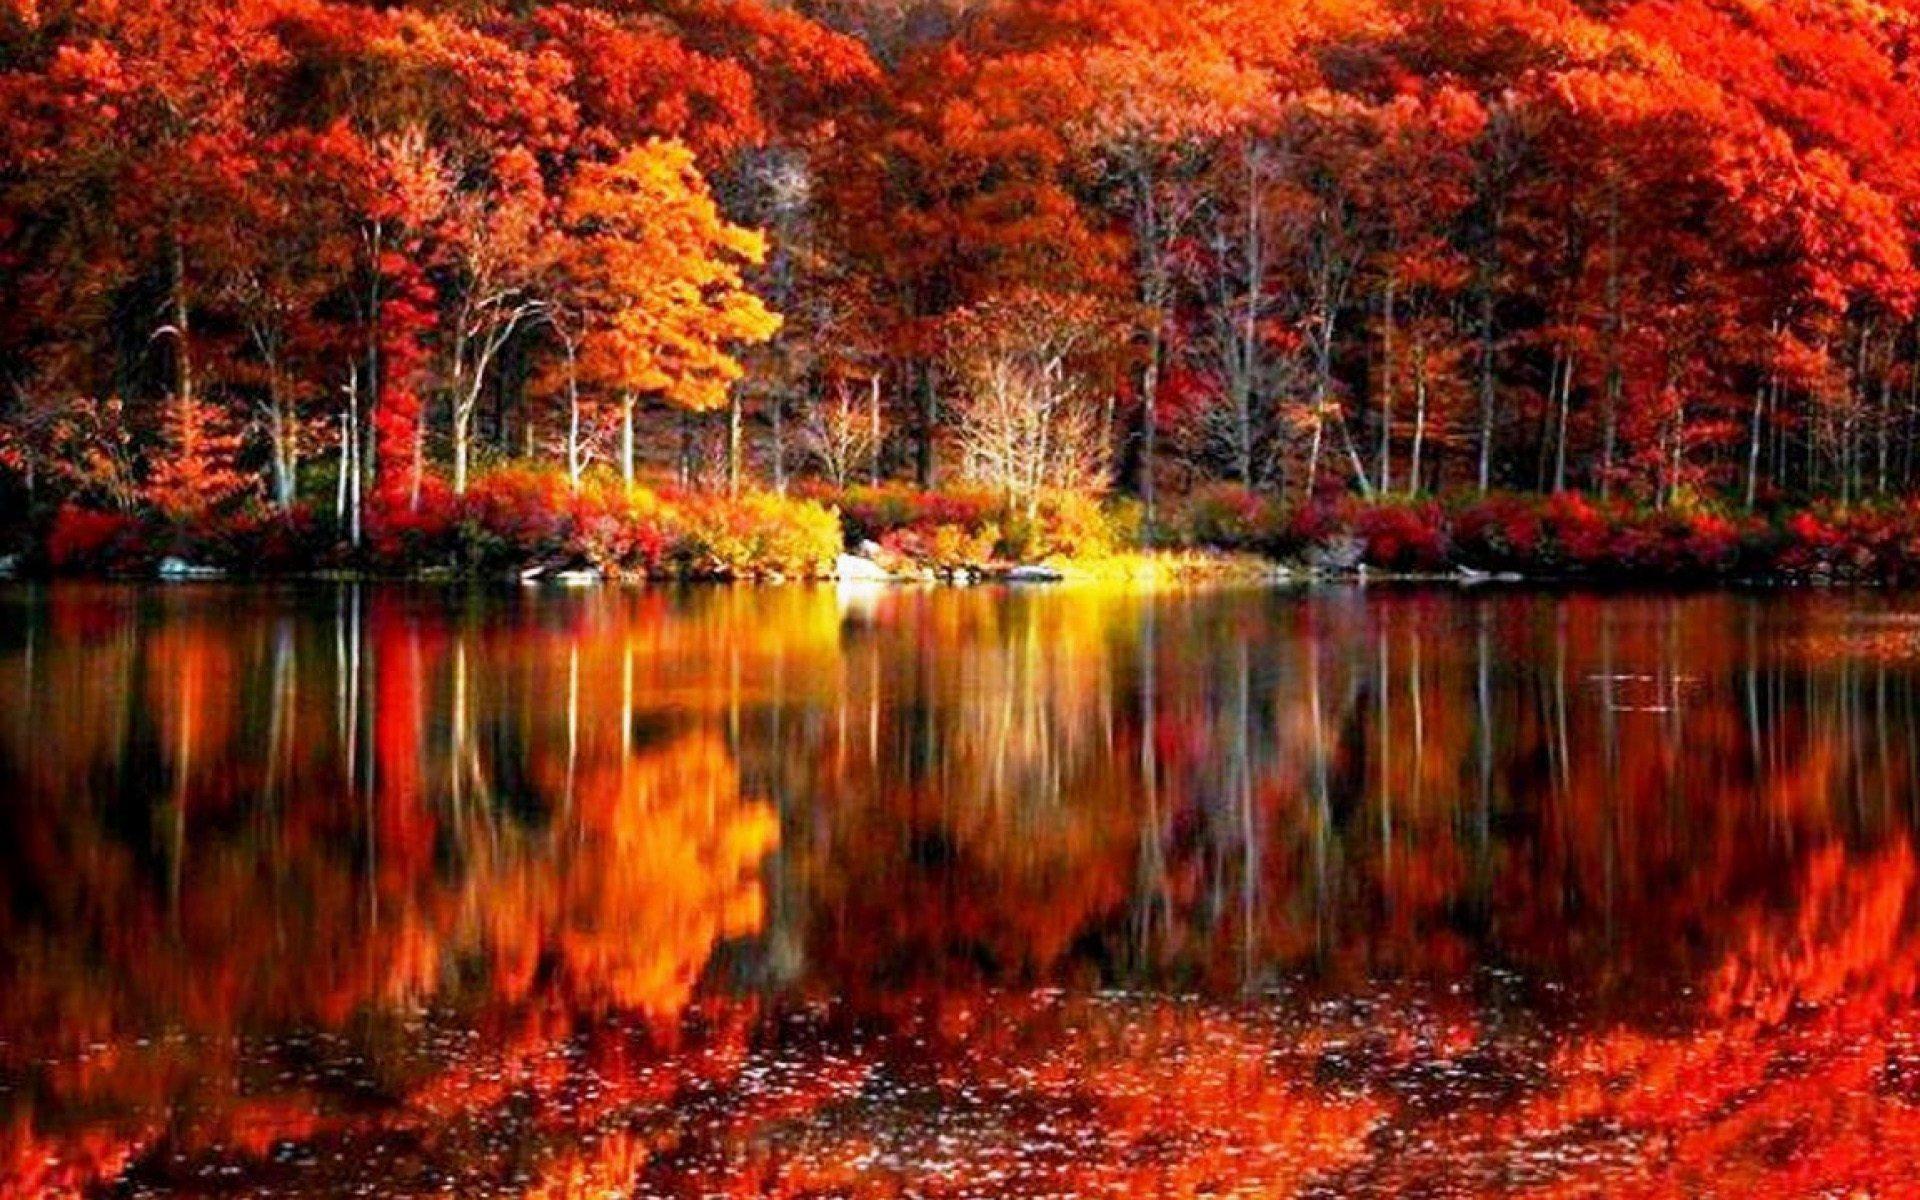 wallpaper.wiki-Fall-Foliage-Wallpaper-Free-Download-PIC-